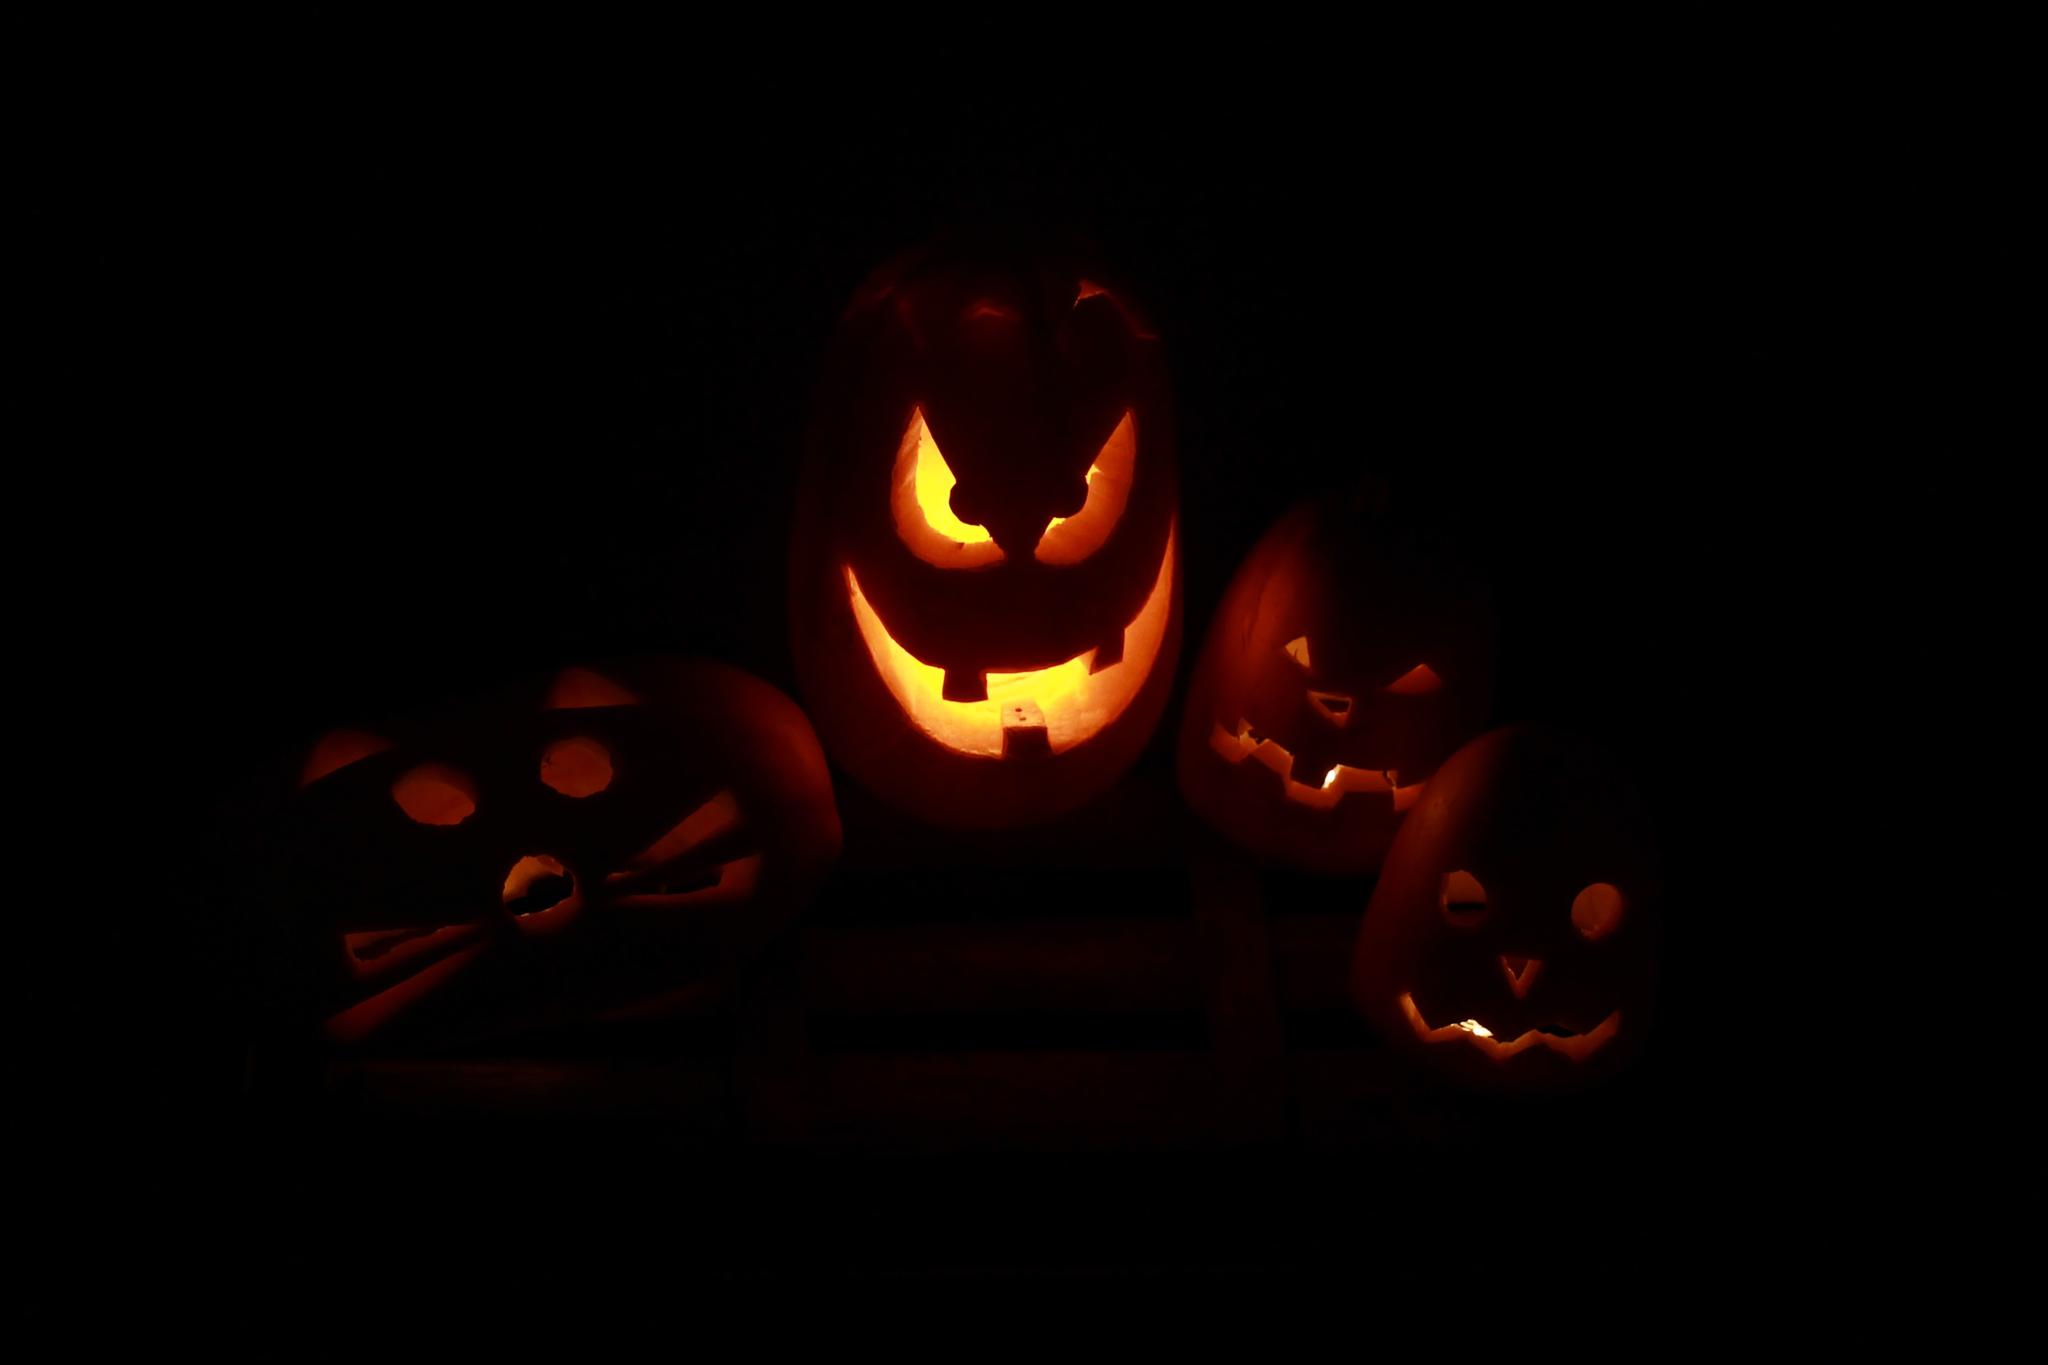 Night of the pumpkins by Bettina Bognár